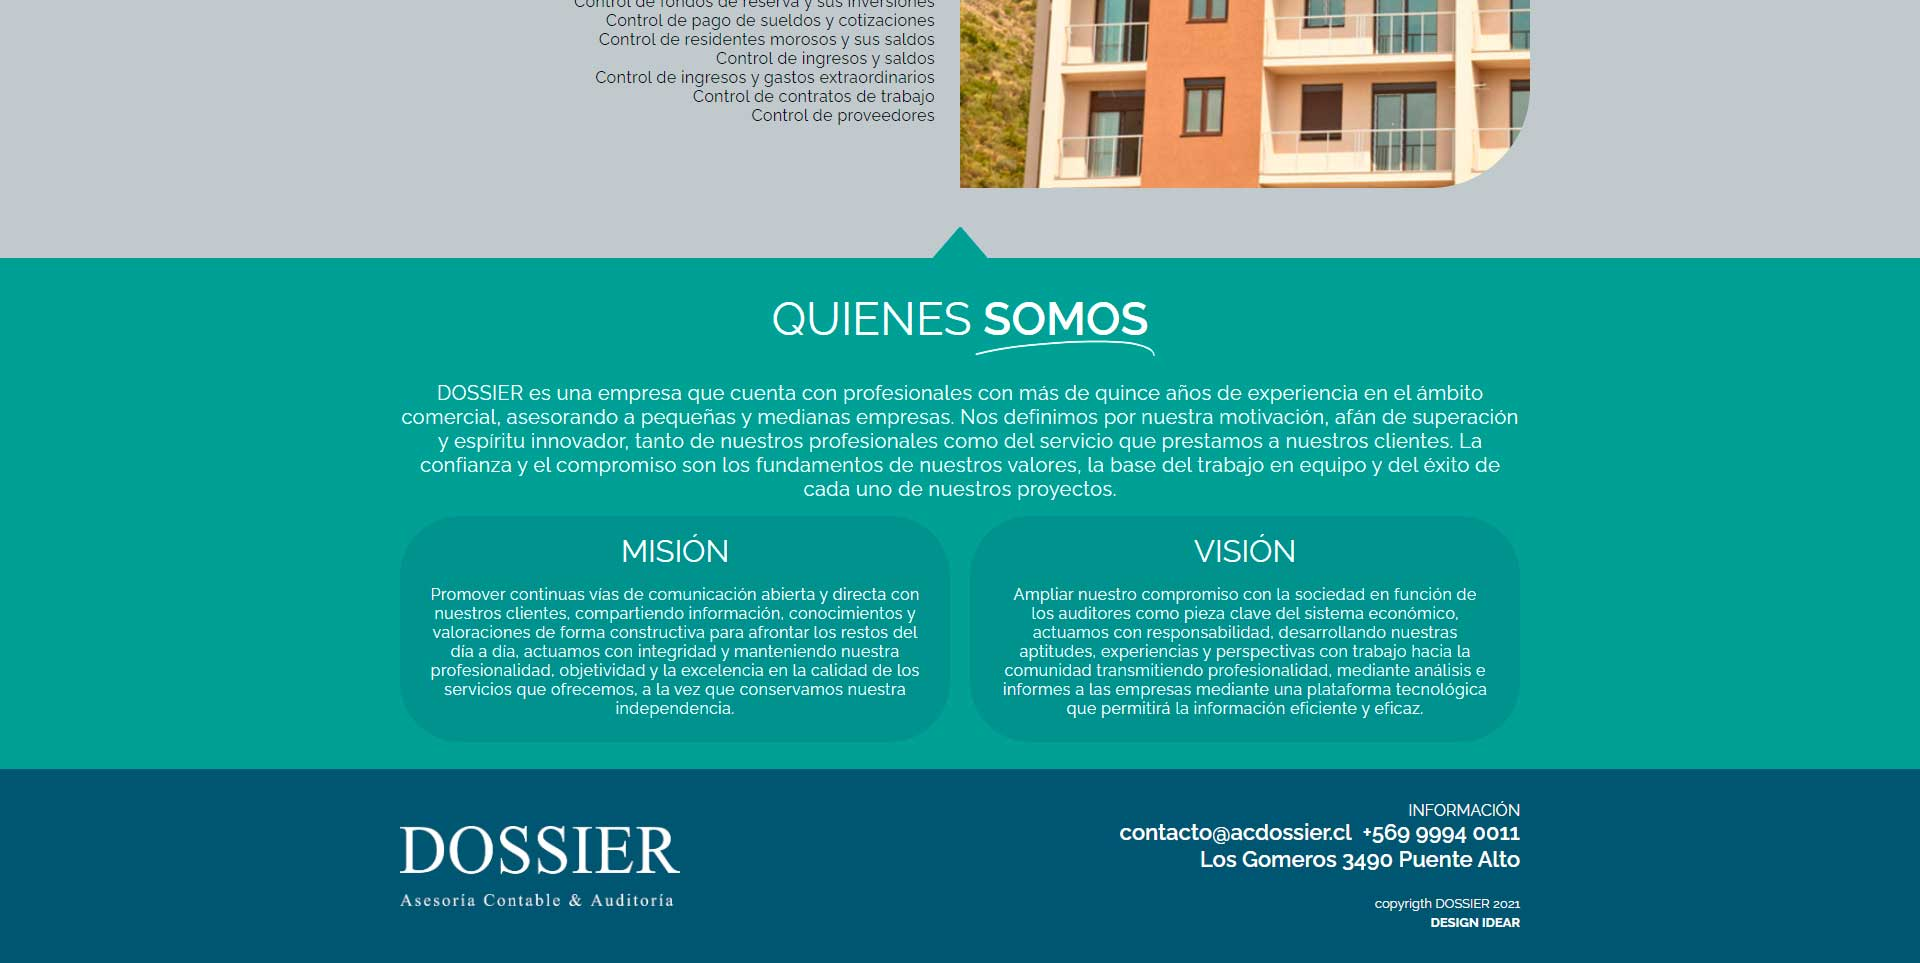 ac-dossier-004